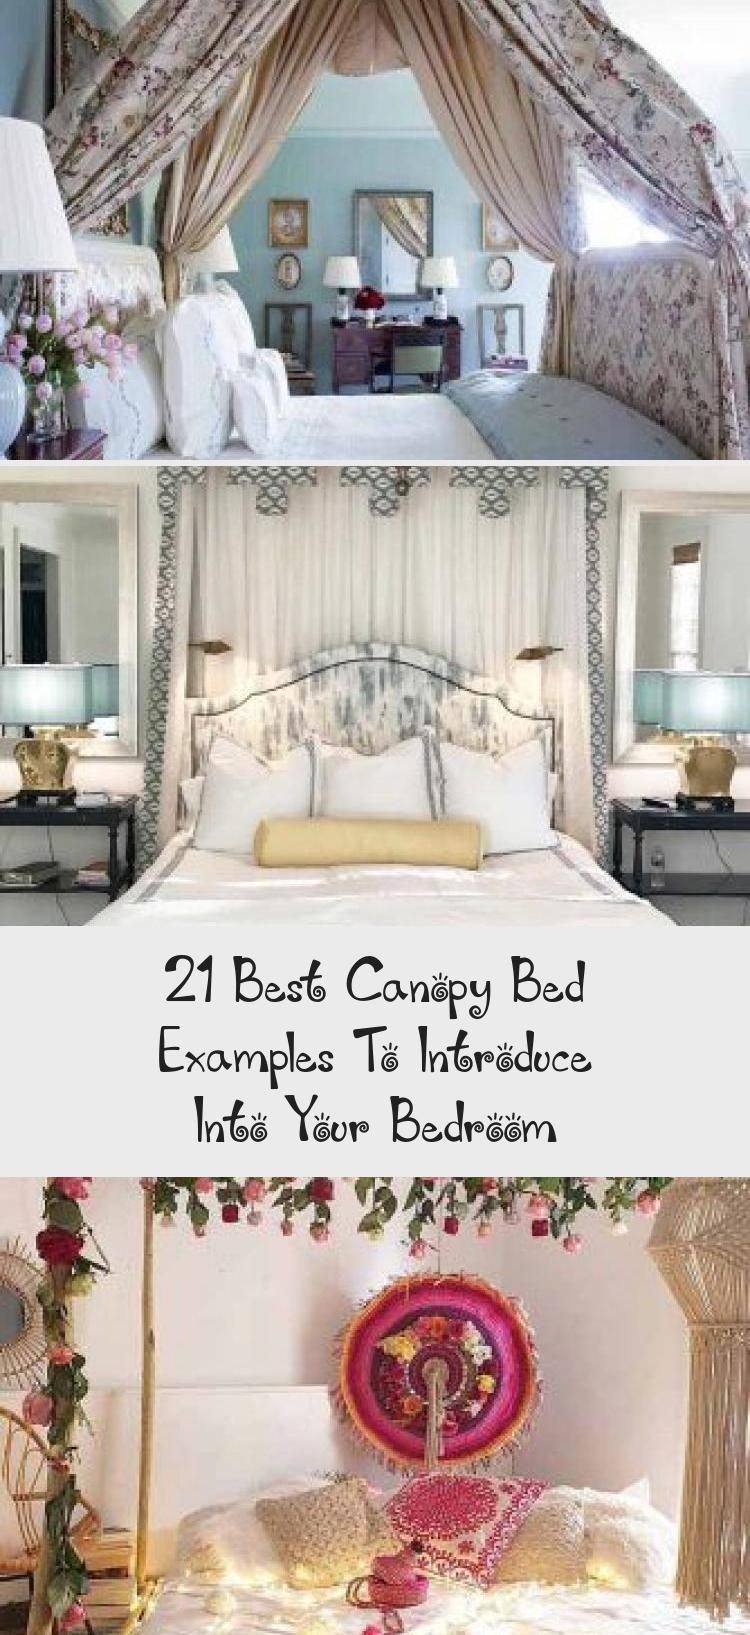 Boho Bedroom Design With Rustic Bed #plants ★ Best in 2020 ... on Modern Boho Bed Frame  id=48138